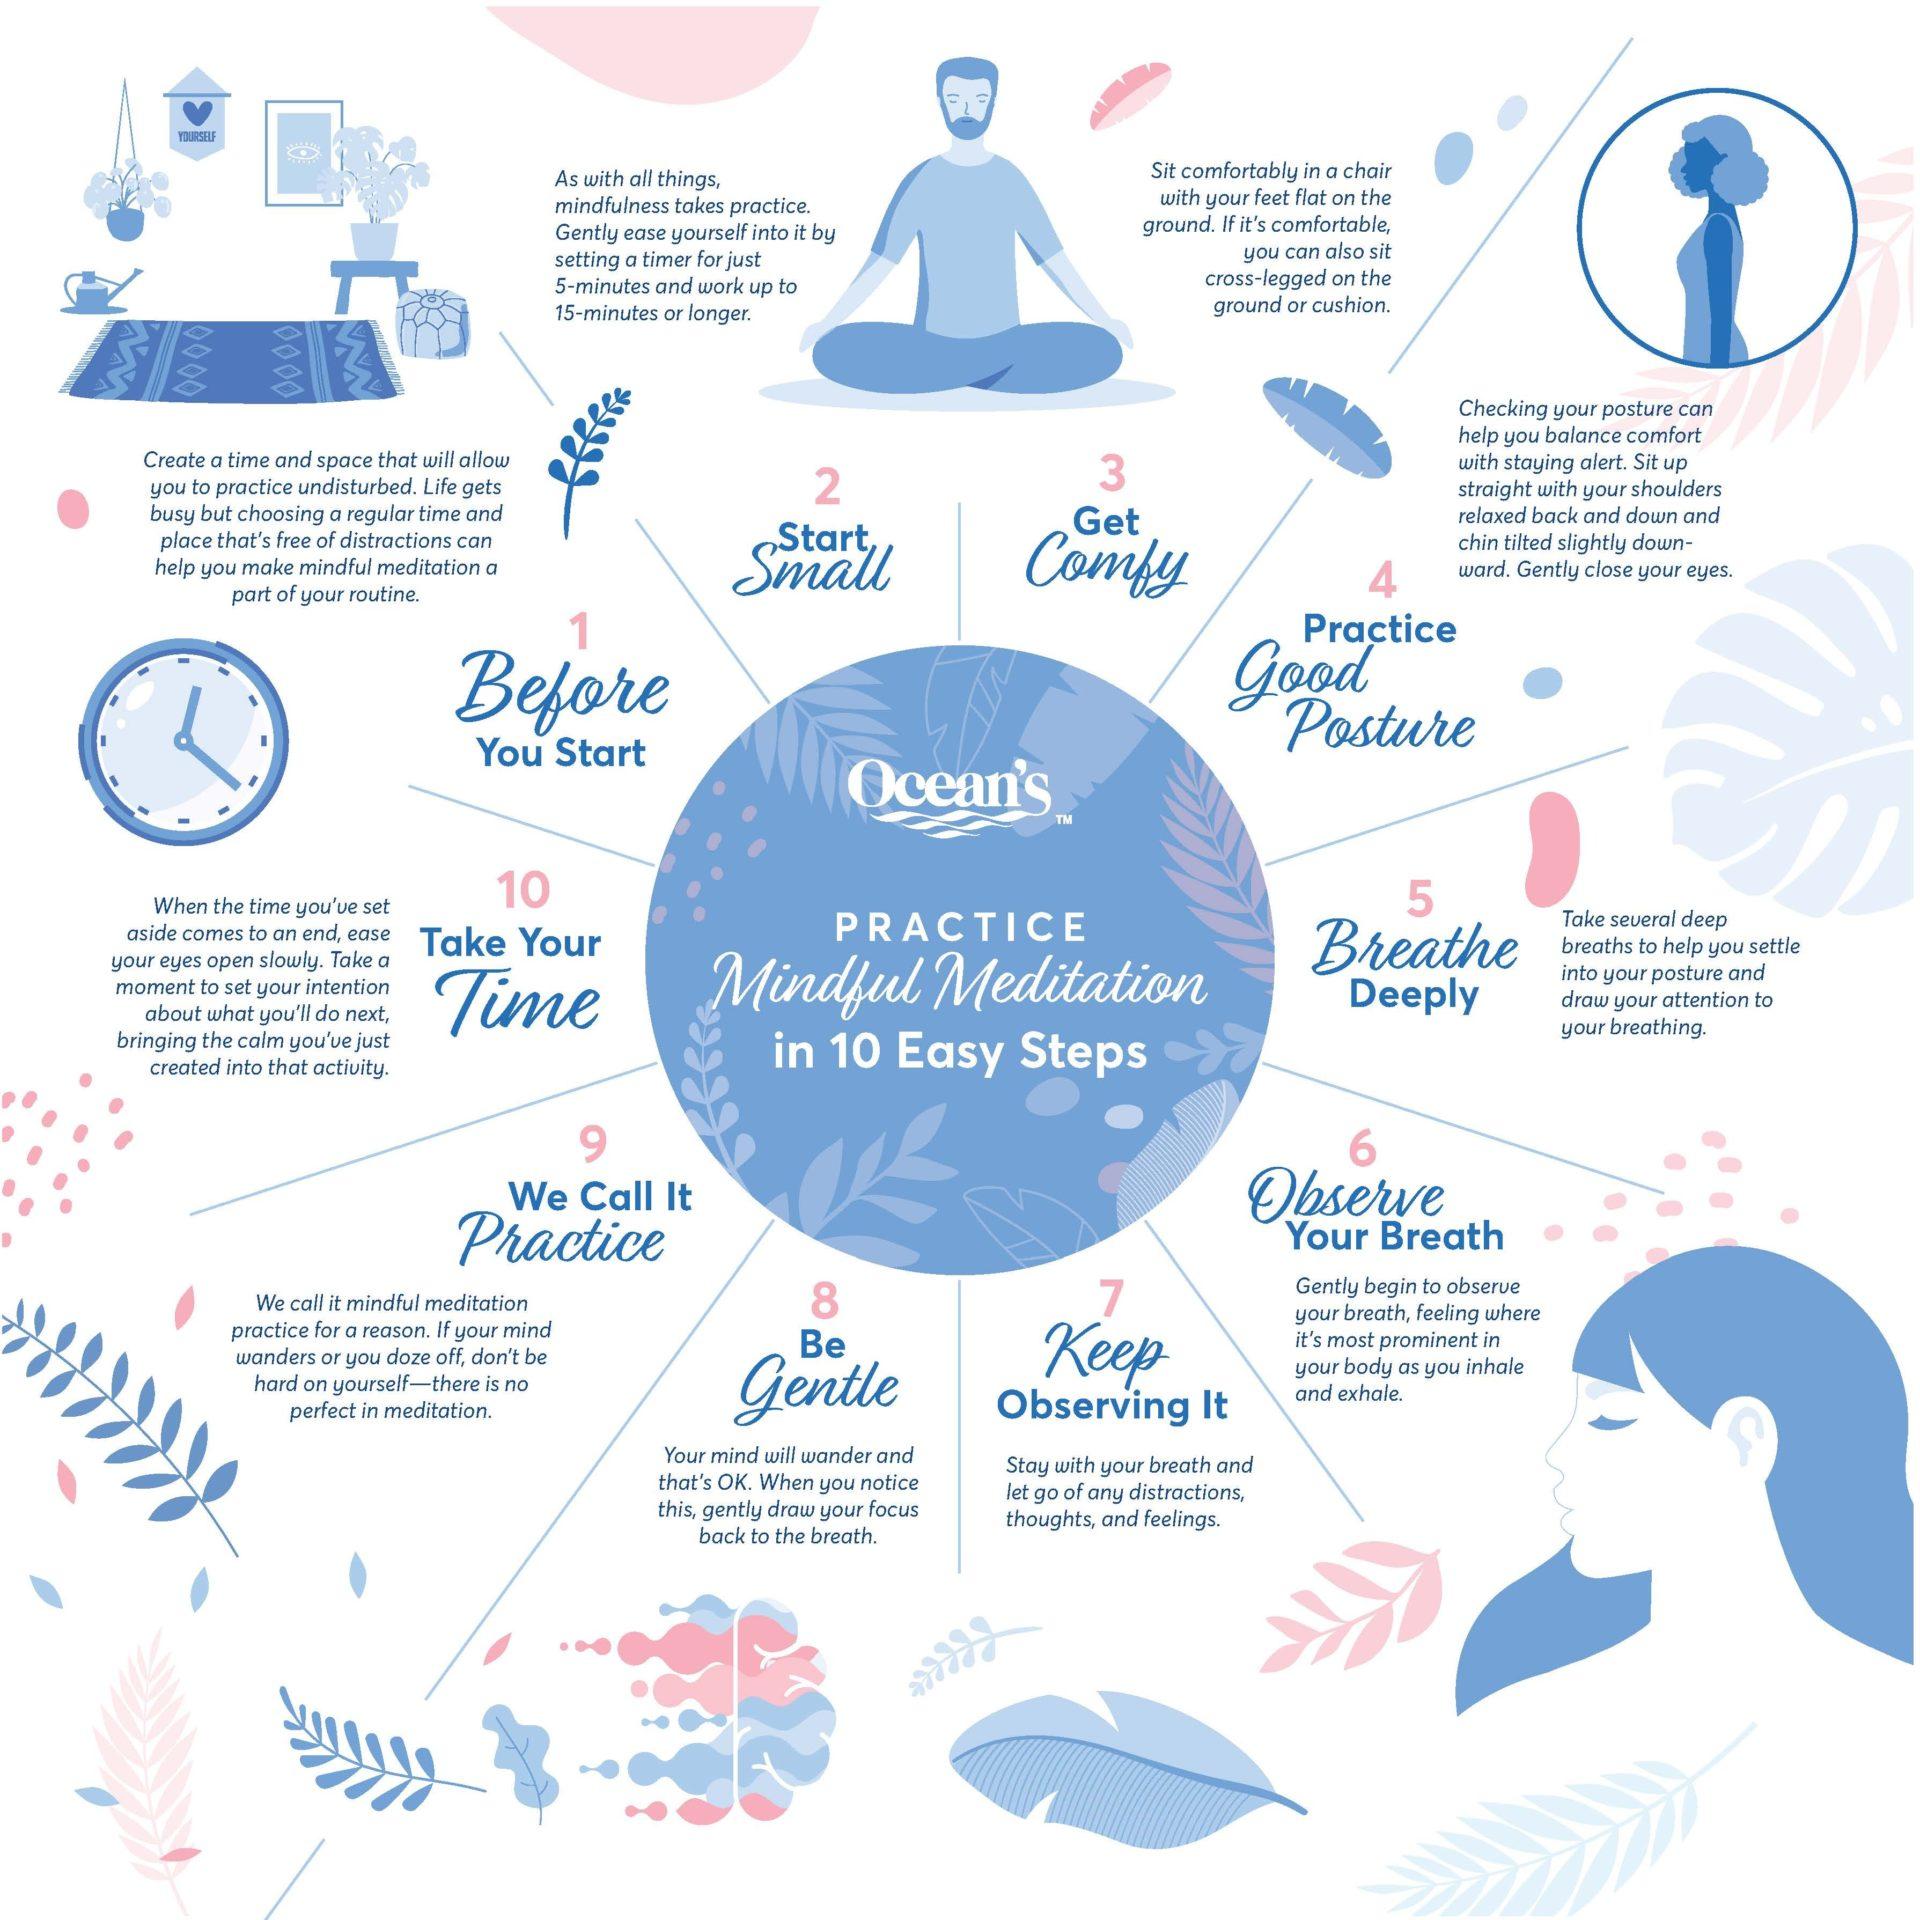 Oceans Holiday Meditation Guide